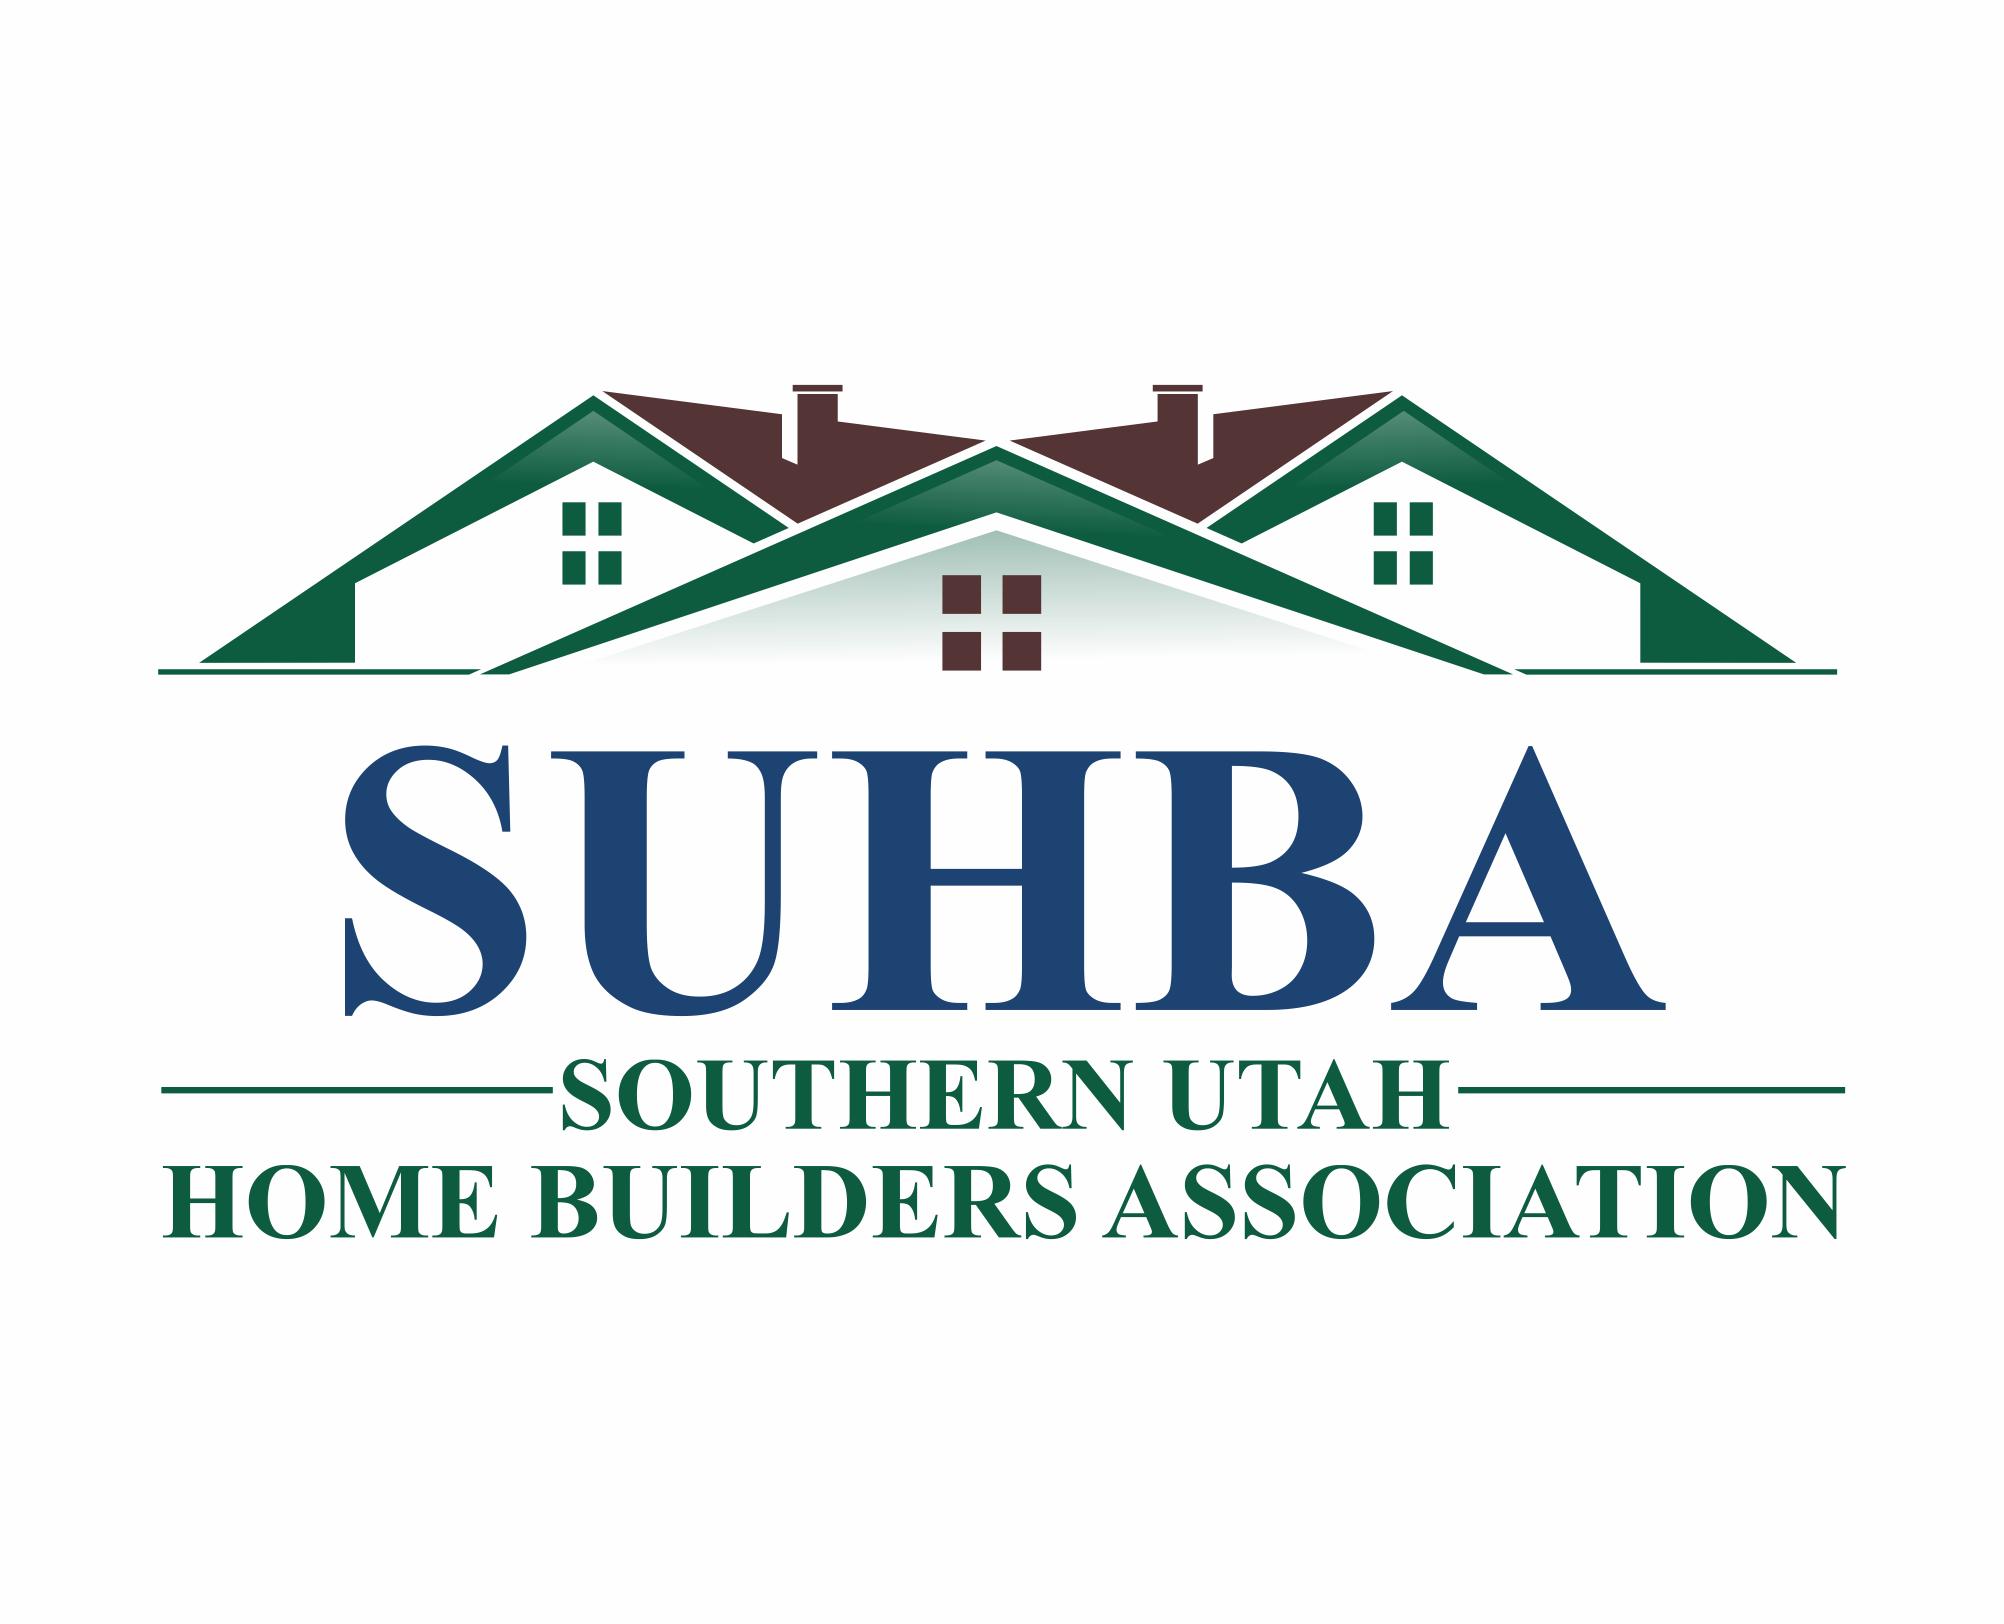 Southern Utah HBA